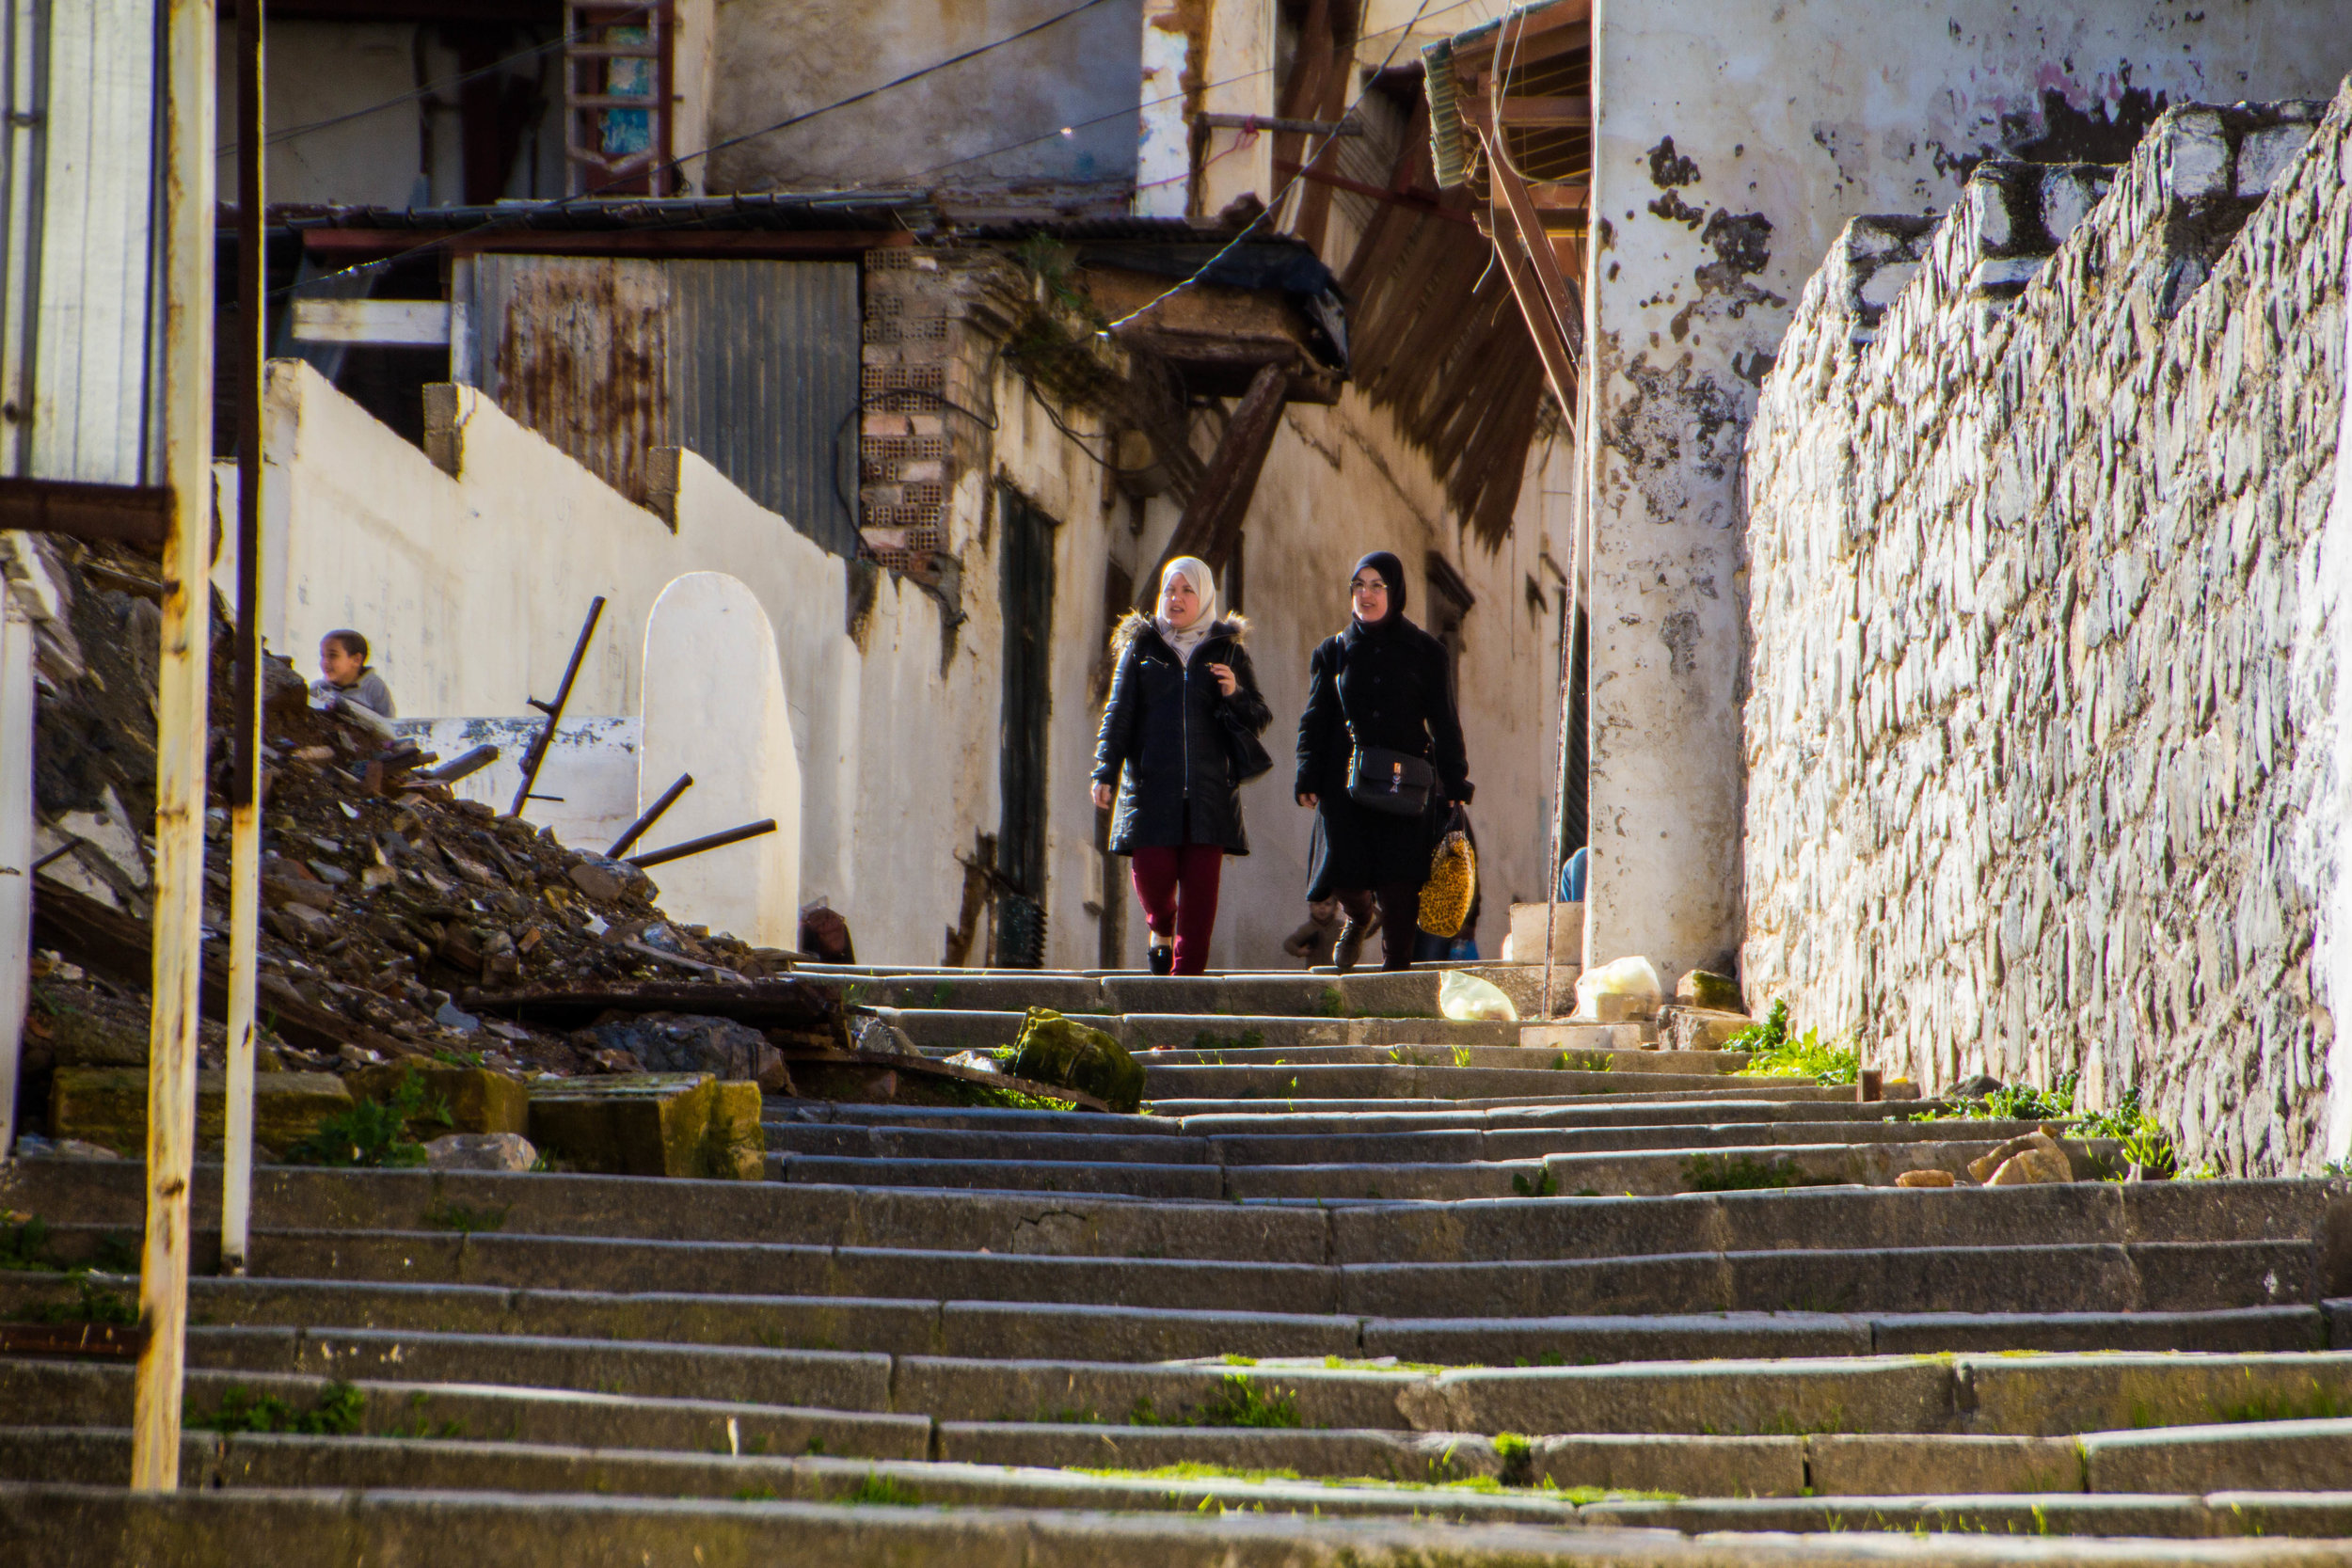 casbah-photography-algiers-algeria-alger-46.jpg